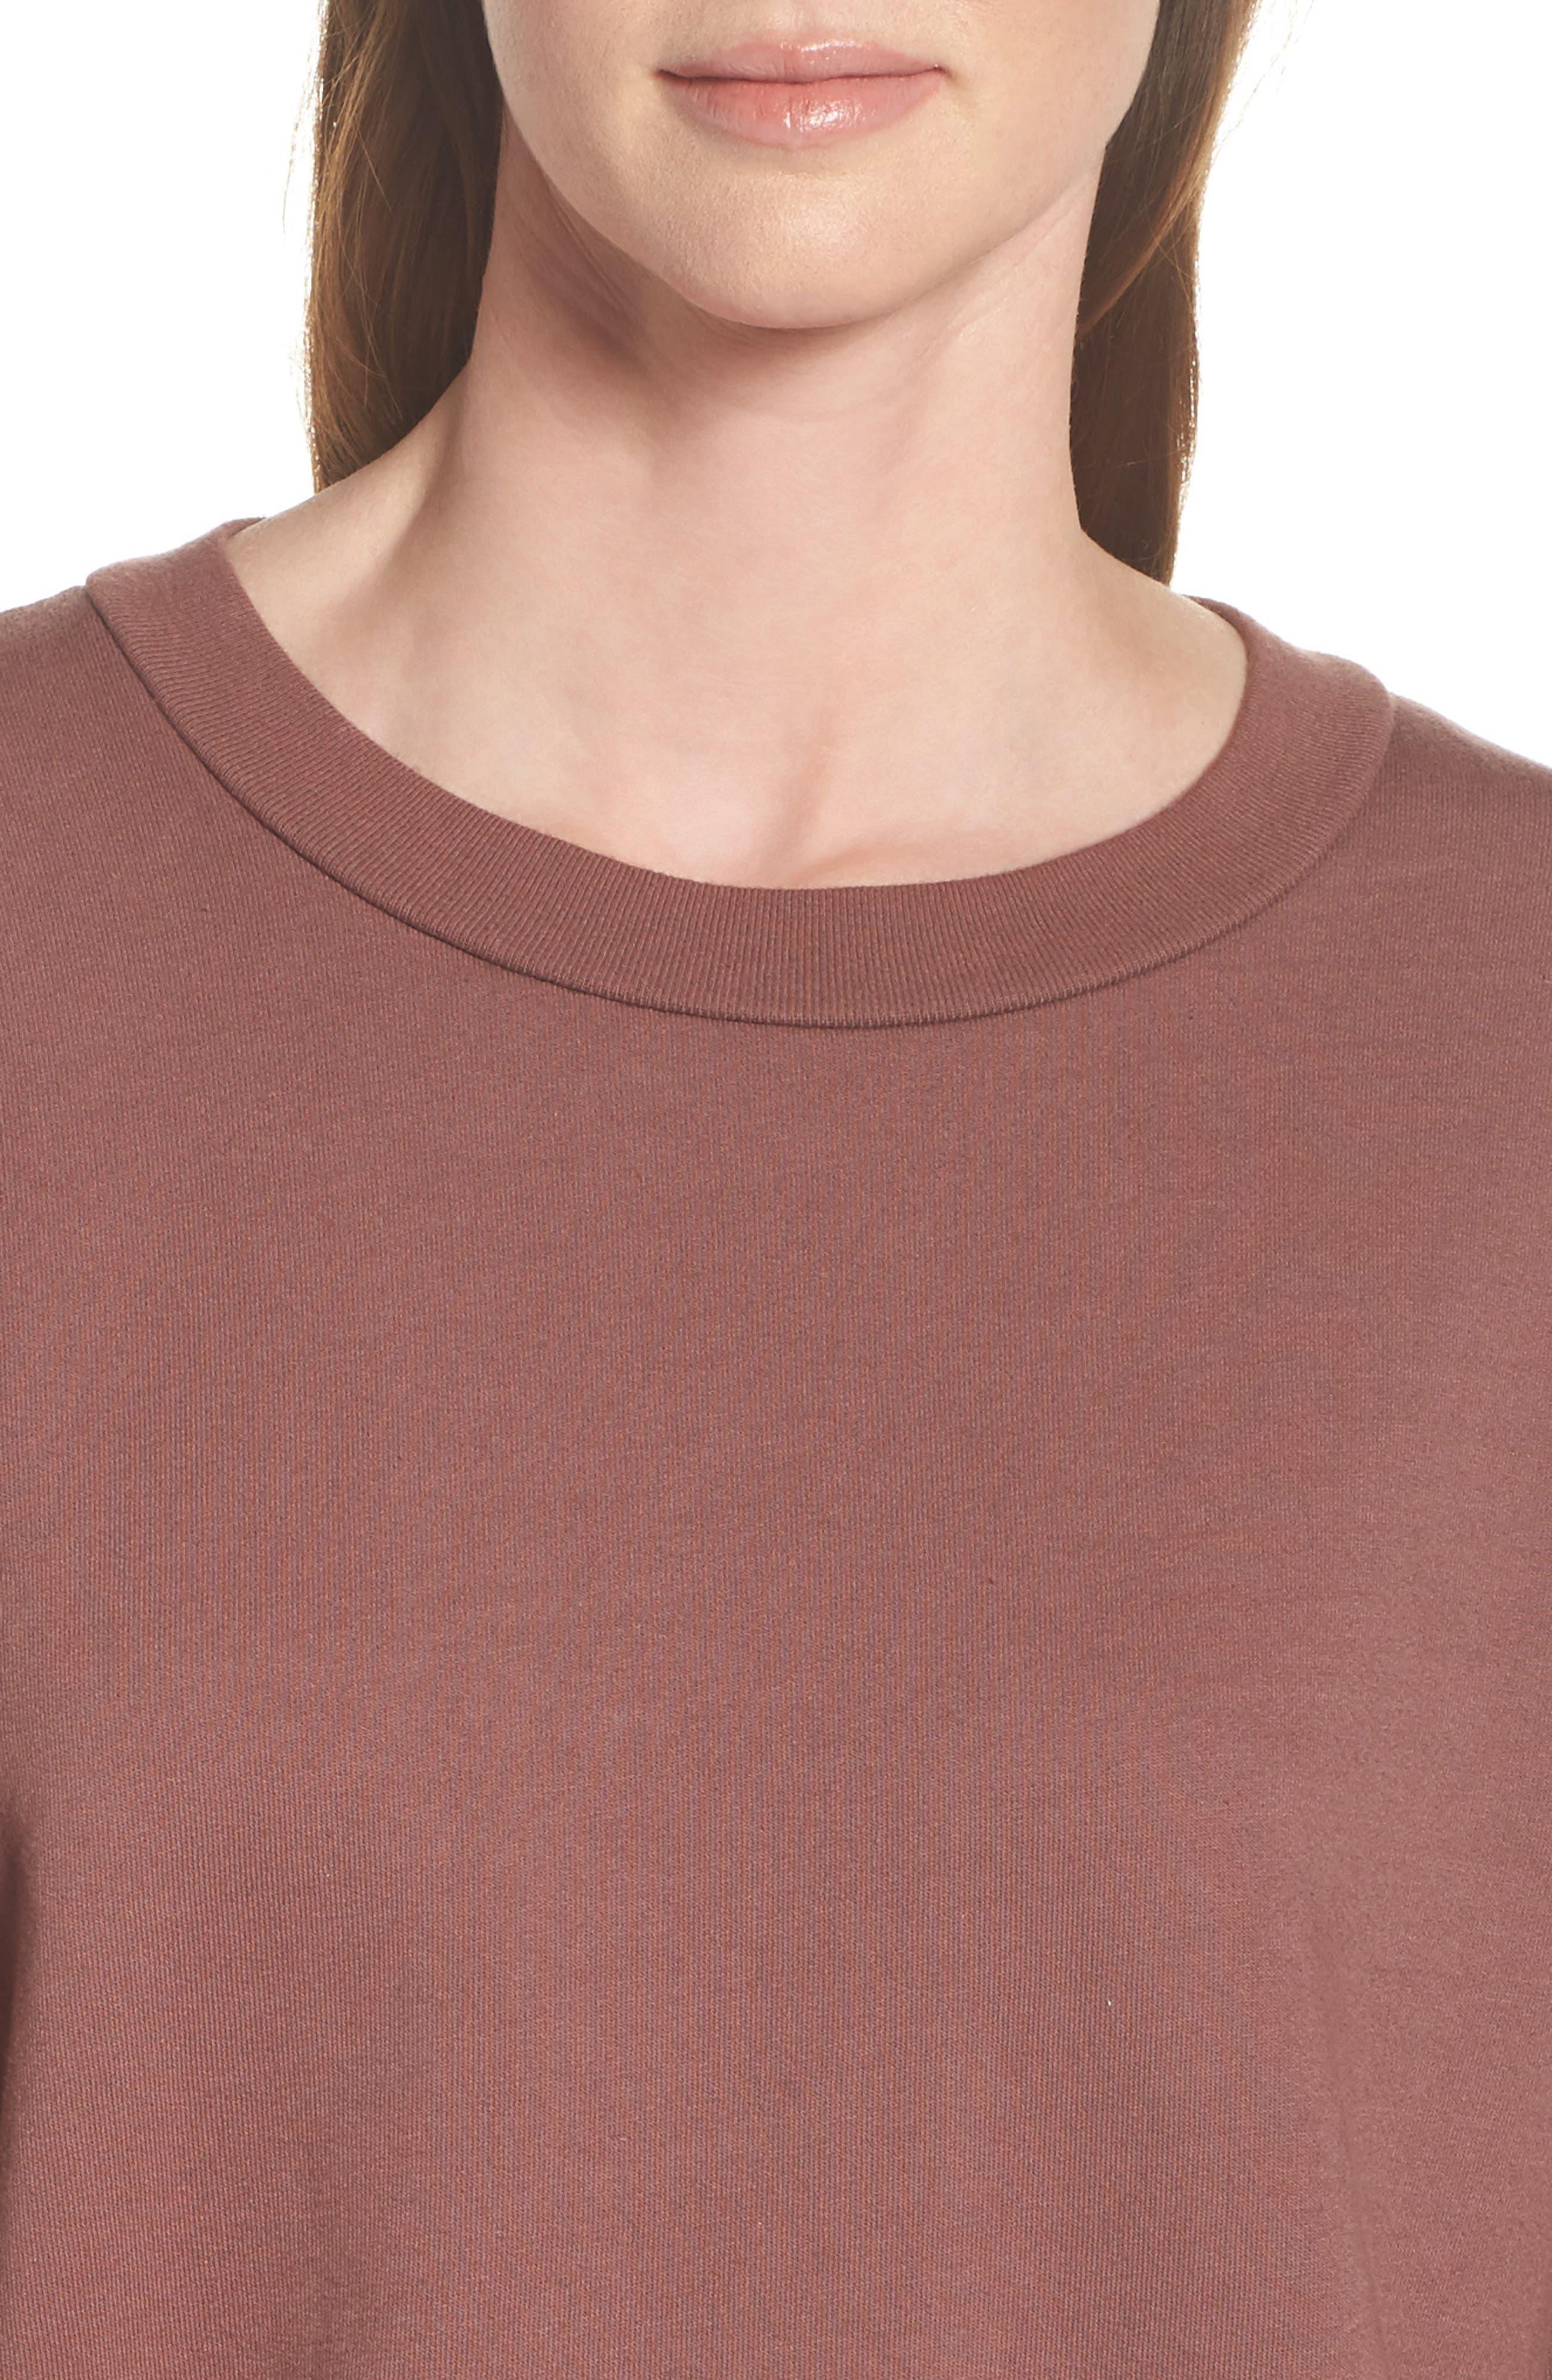 Ellstan Oversize Boyfriend Sweatshirt,                             Alternate thumbnail 8, color,